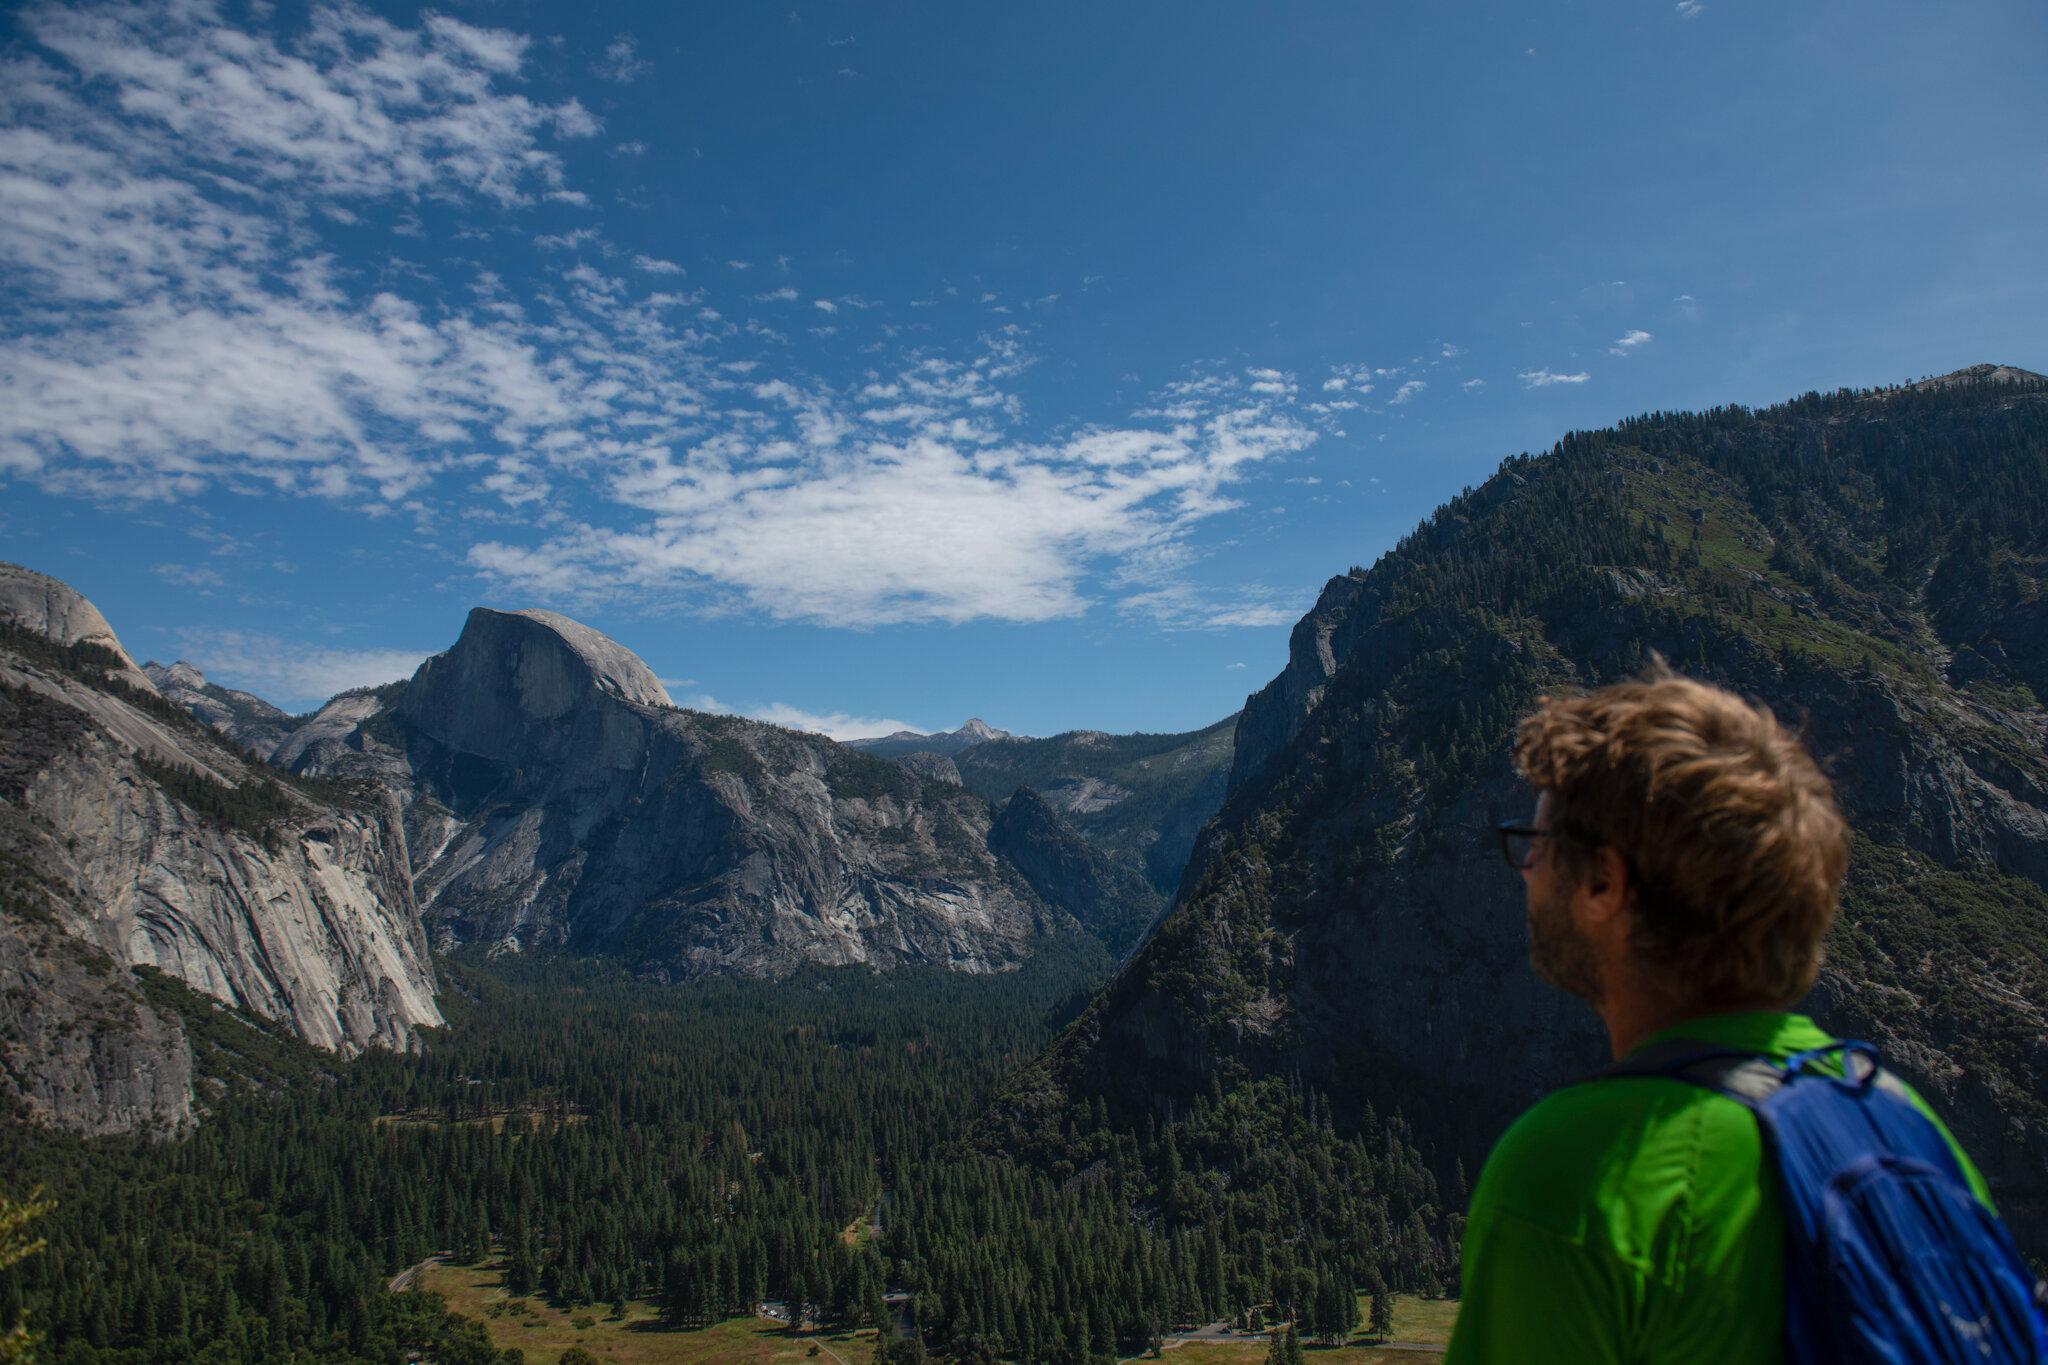 Views along the Upper Yosemite Falls hike